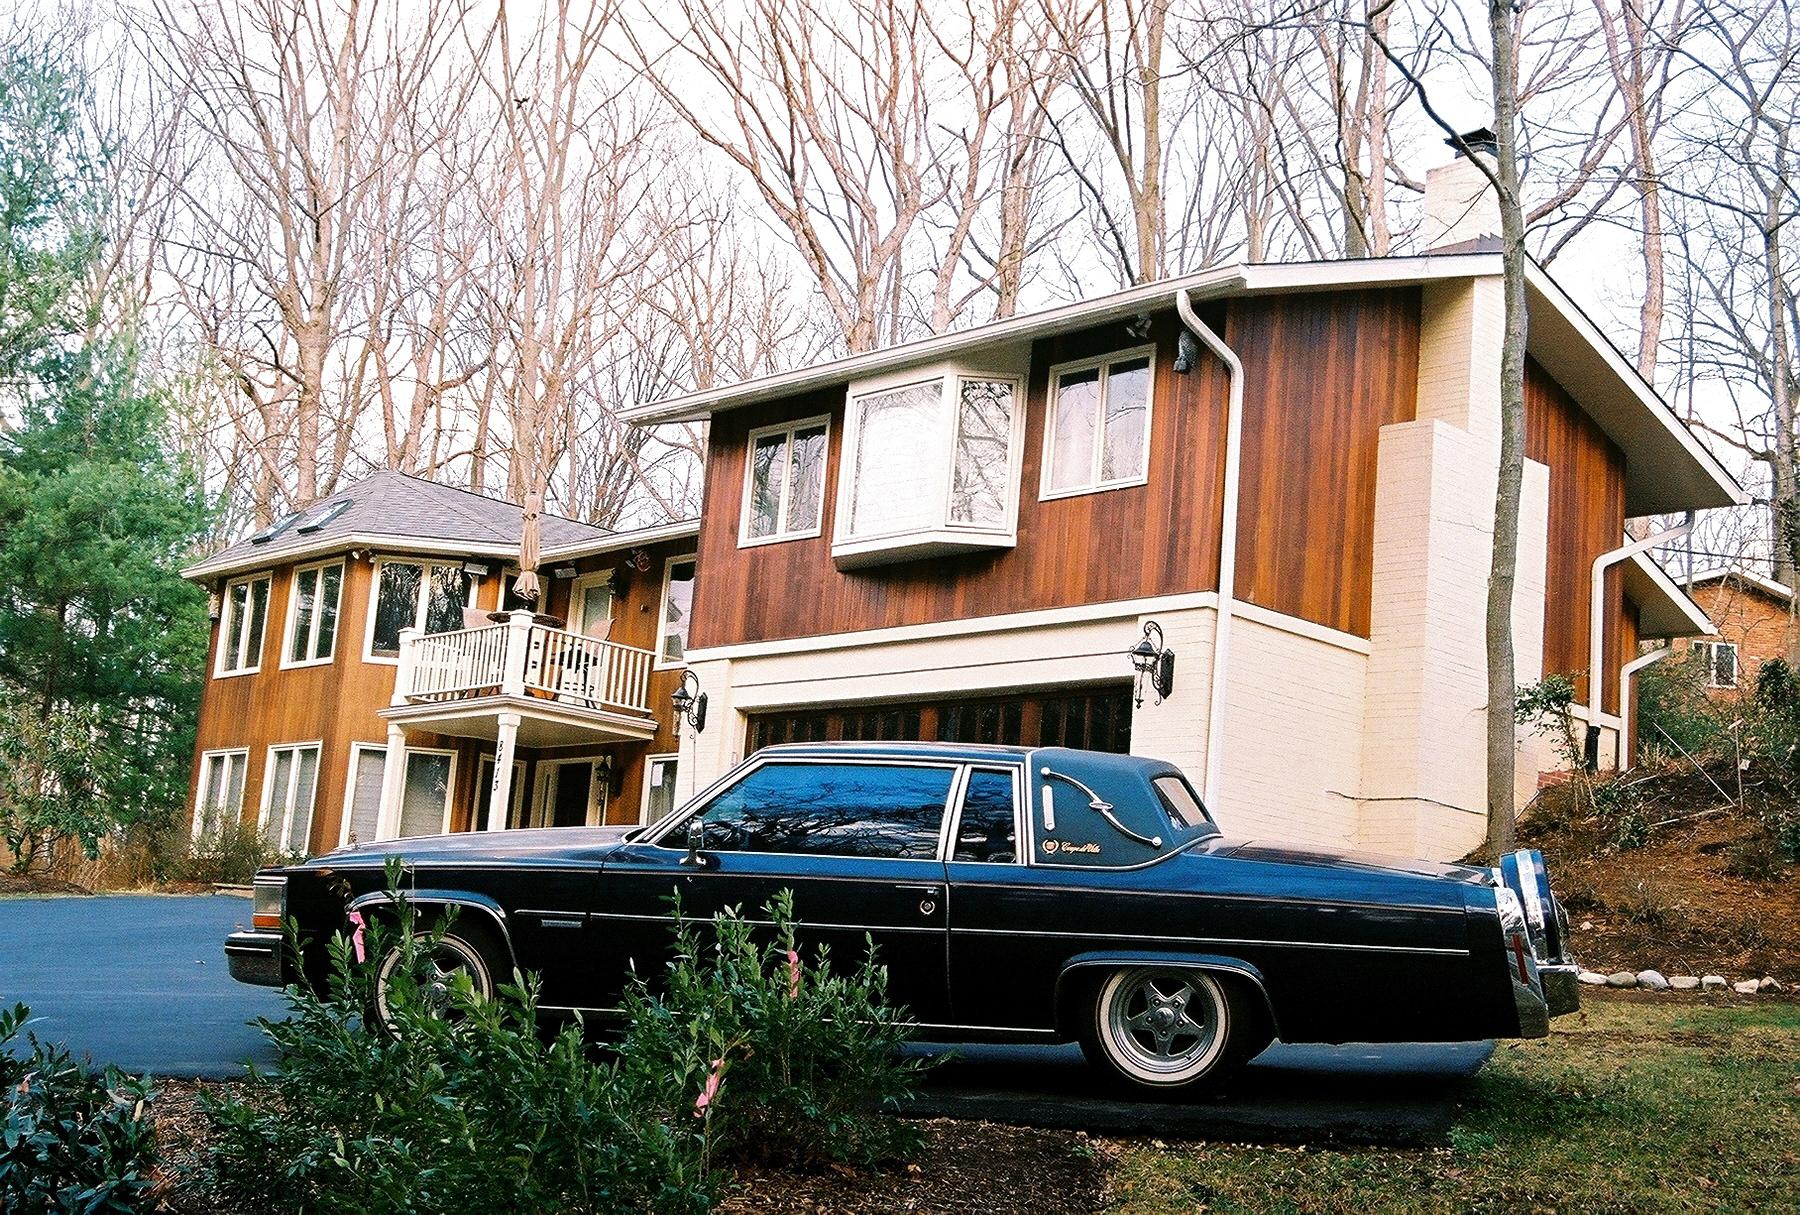 Carderock Springs  Bethesda, Maryland  March 2011  (Kodak Ultramax 400)